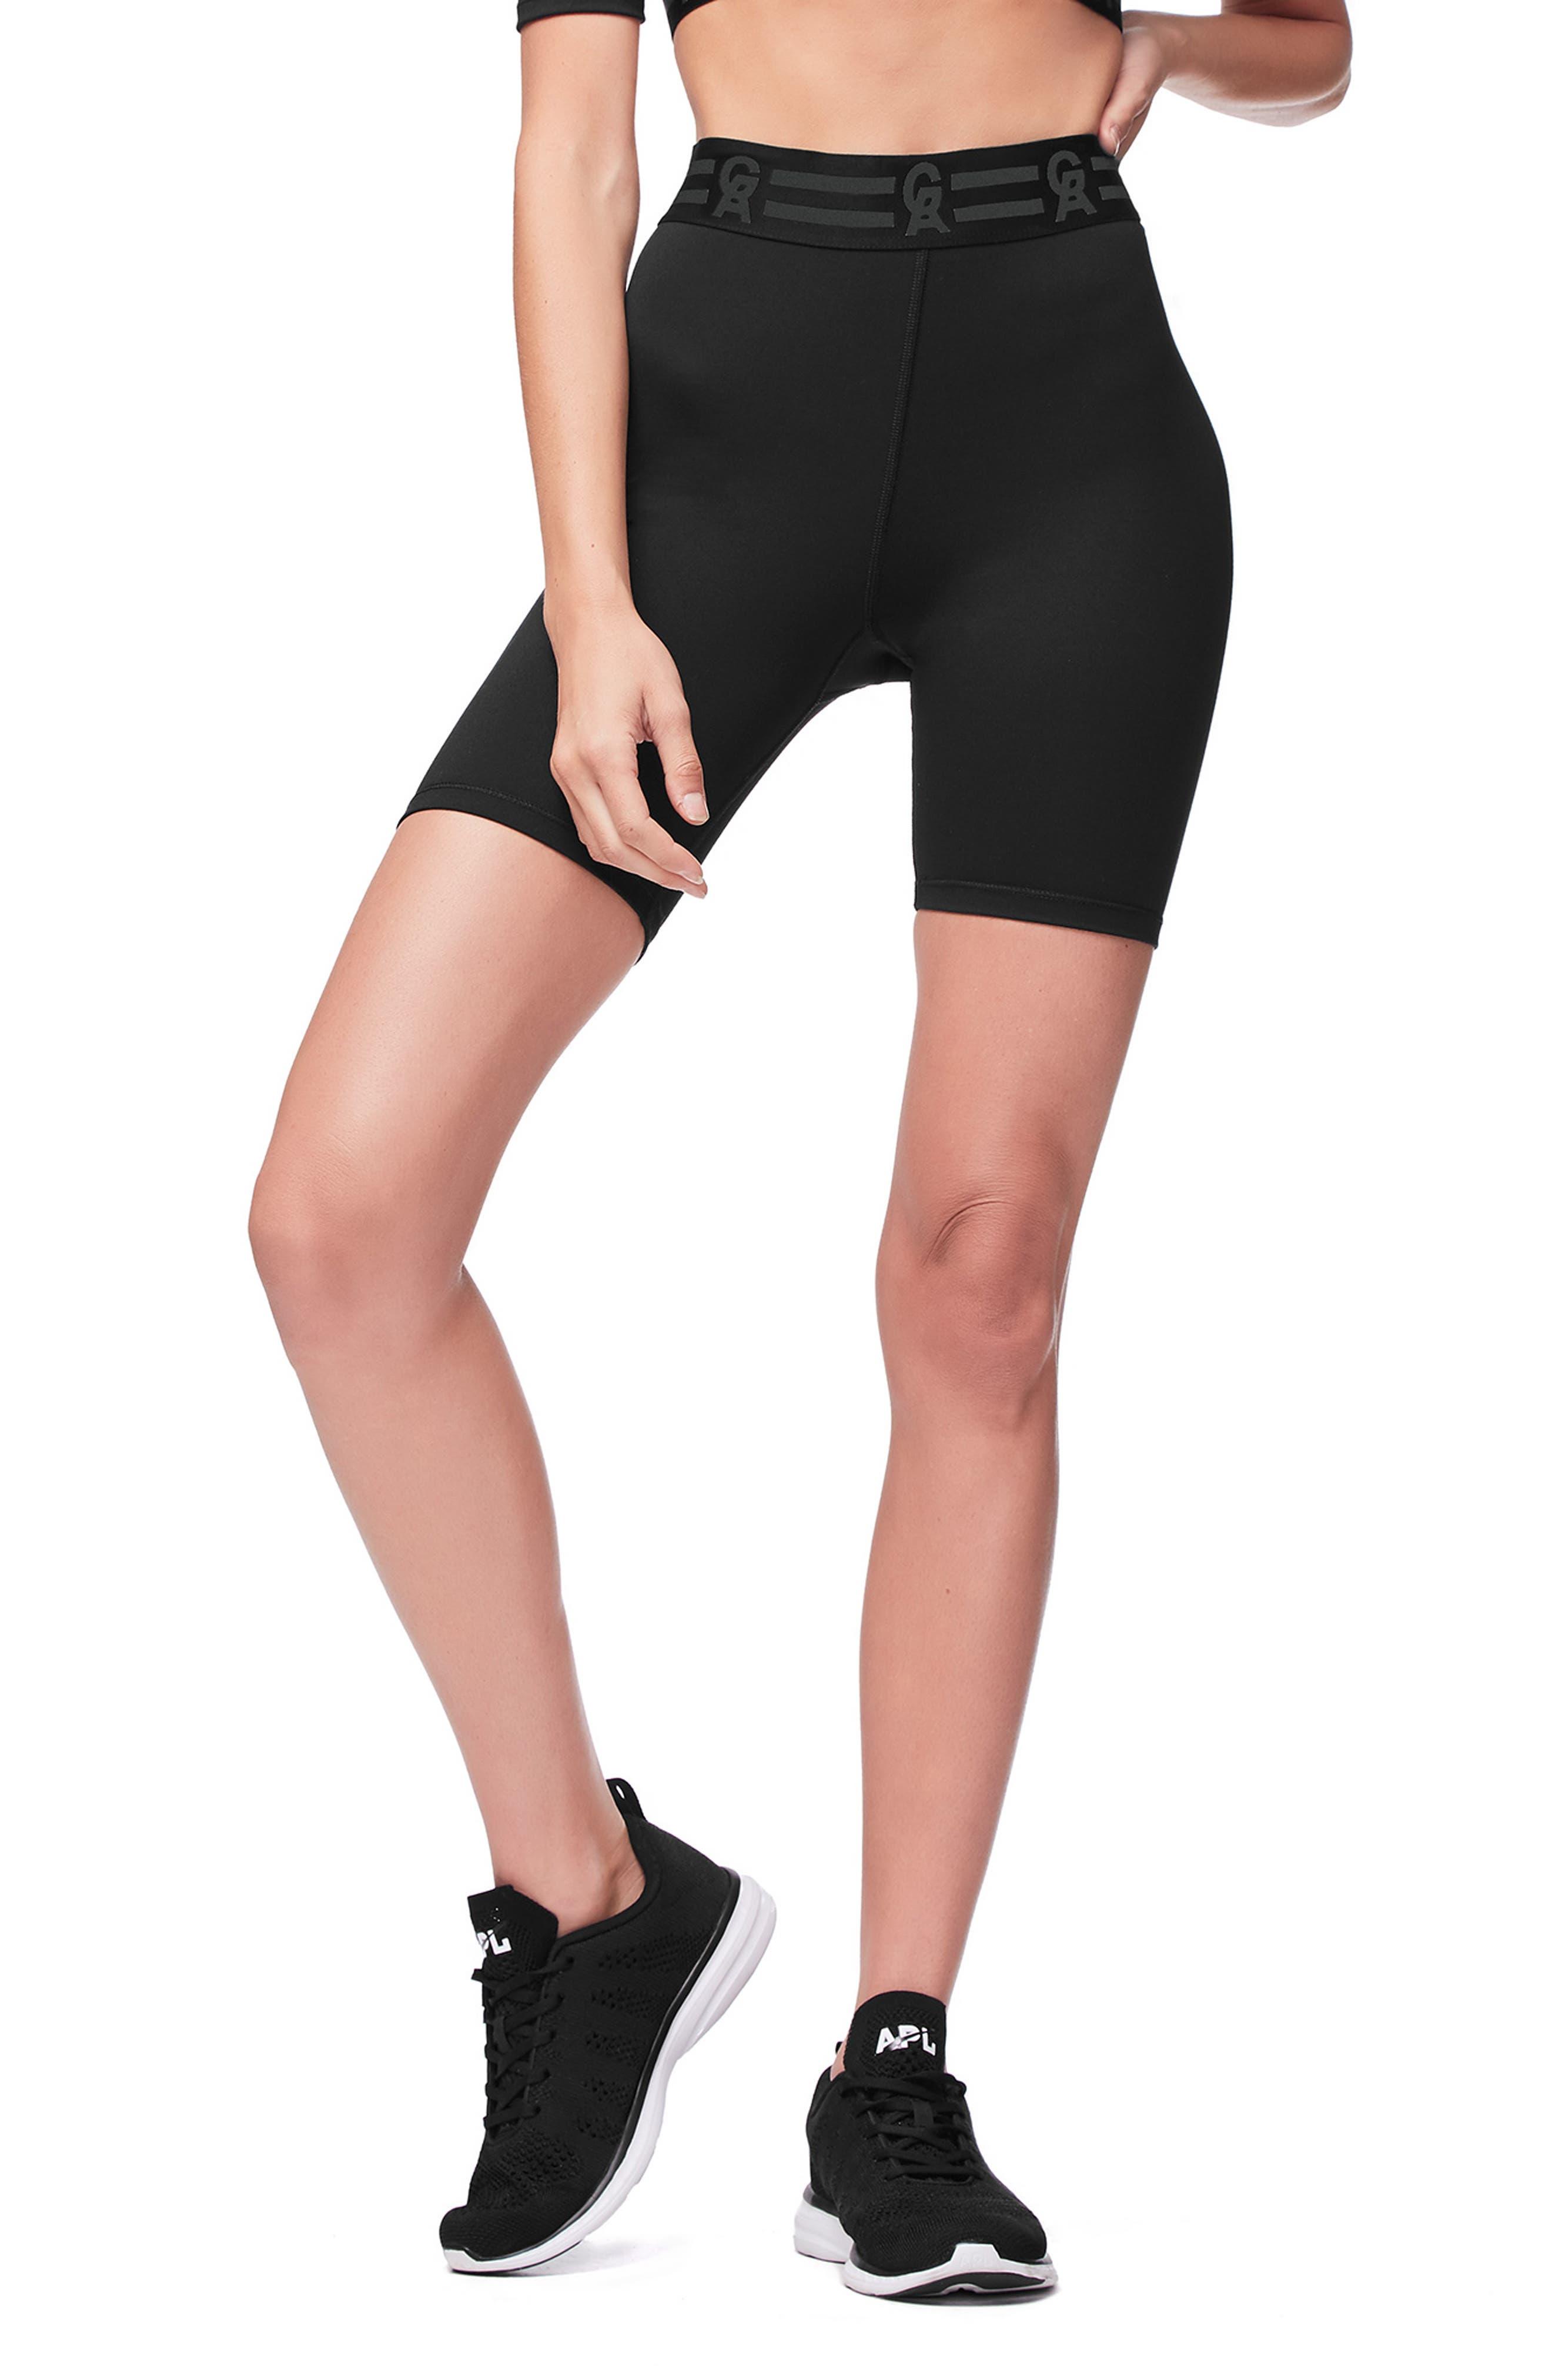 Icon High Waist Biker Shorts,                             Main thumbnail 1, color,                             BLACK001